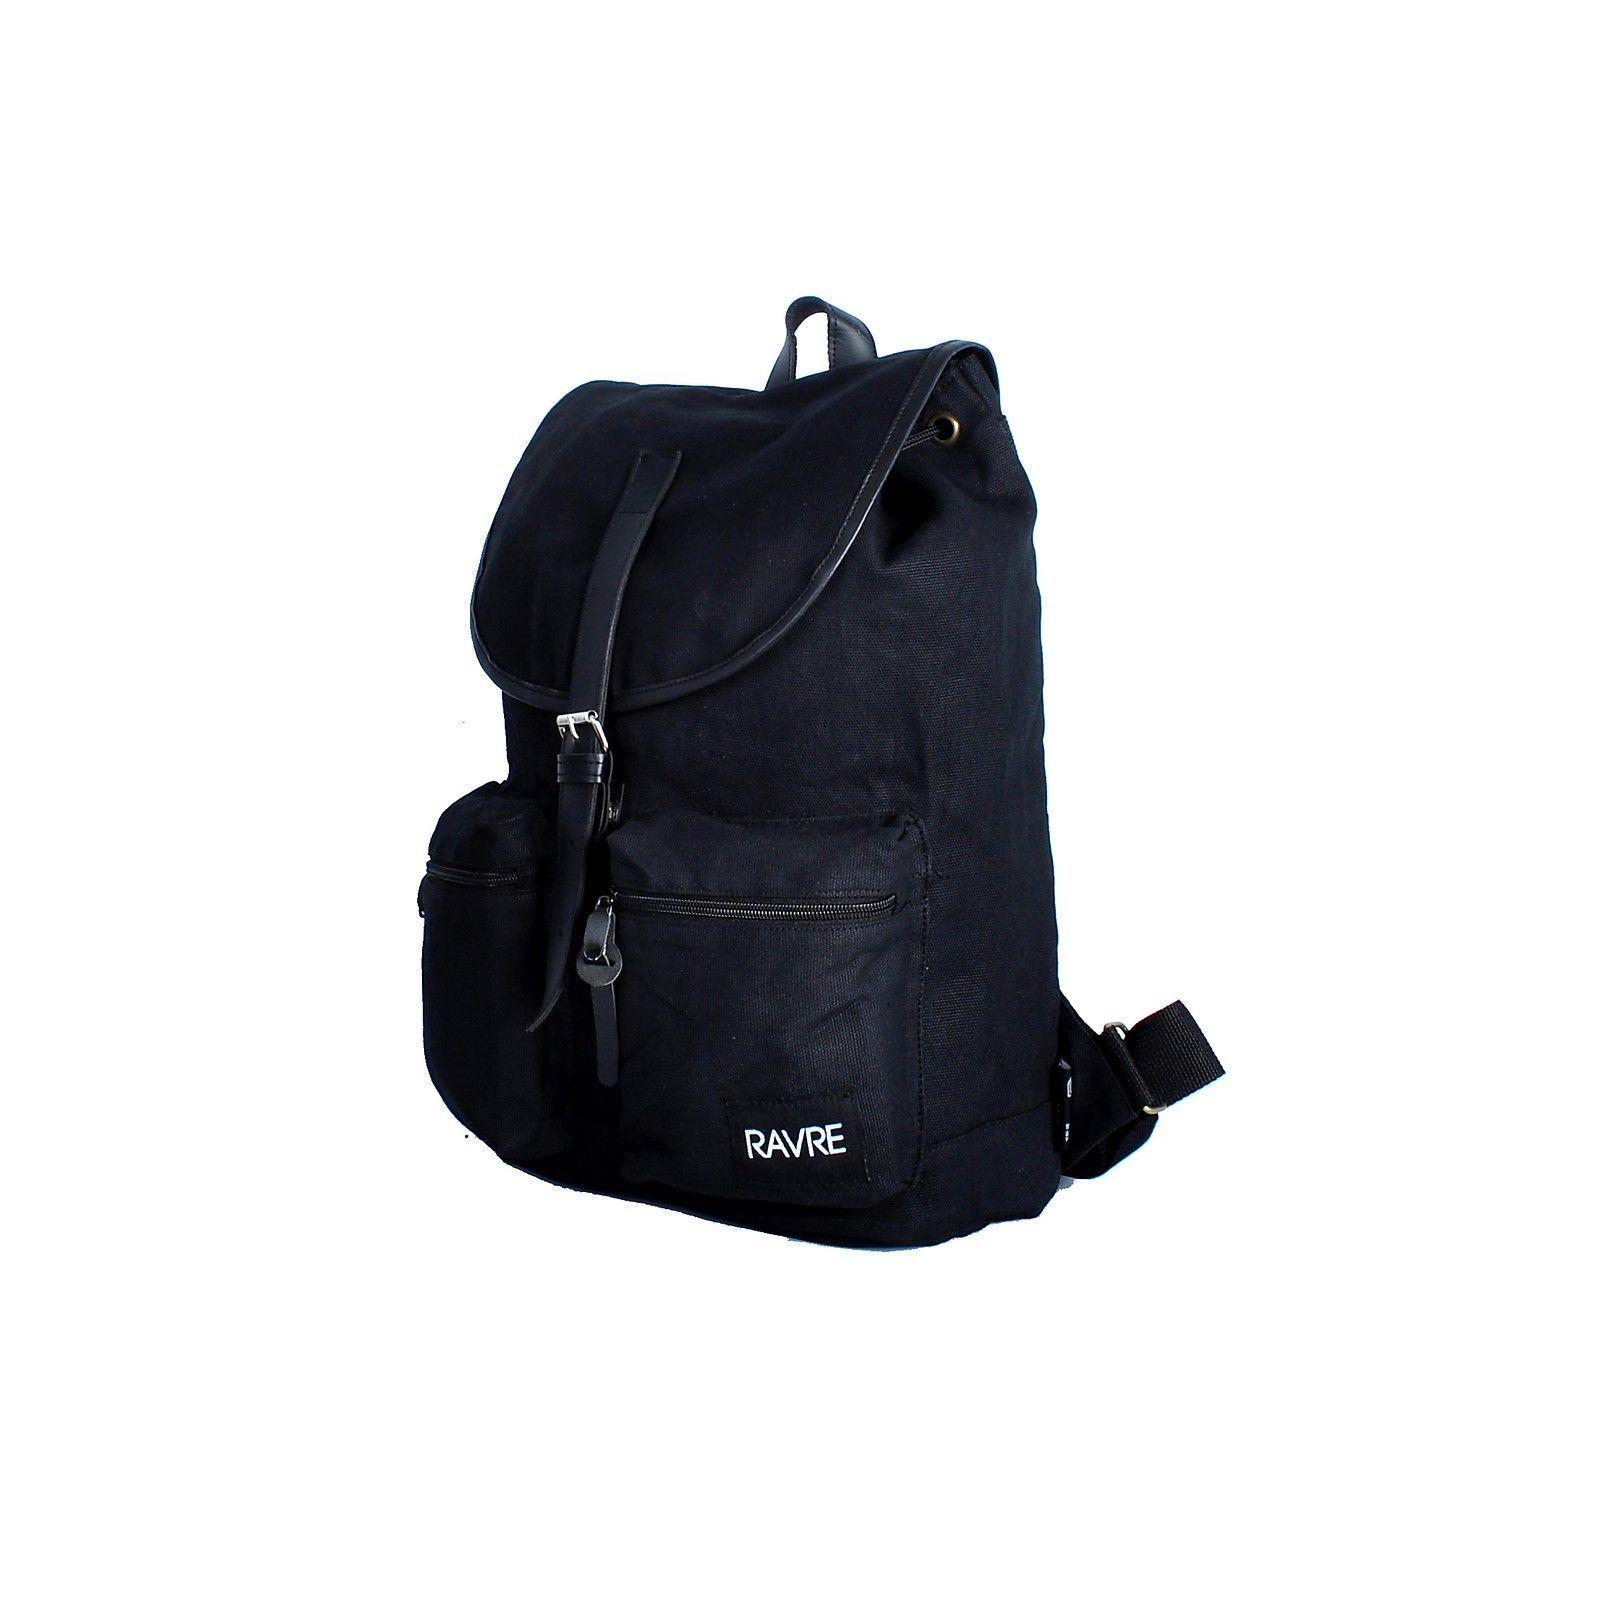 "Stylish 14"" Laptop Computer Backpack School Bag Sport Travel Hiking Rucksack | eBay"